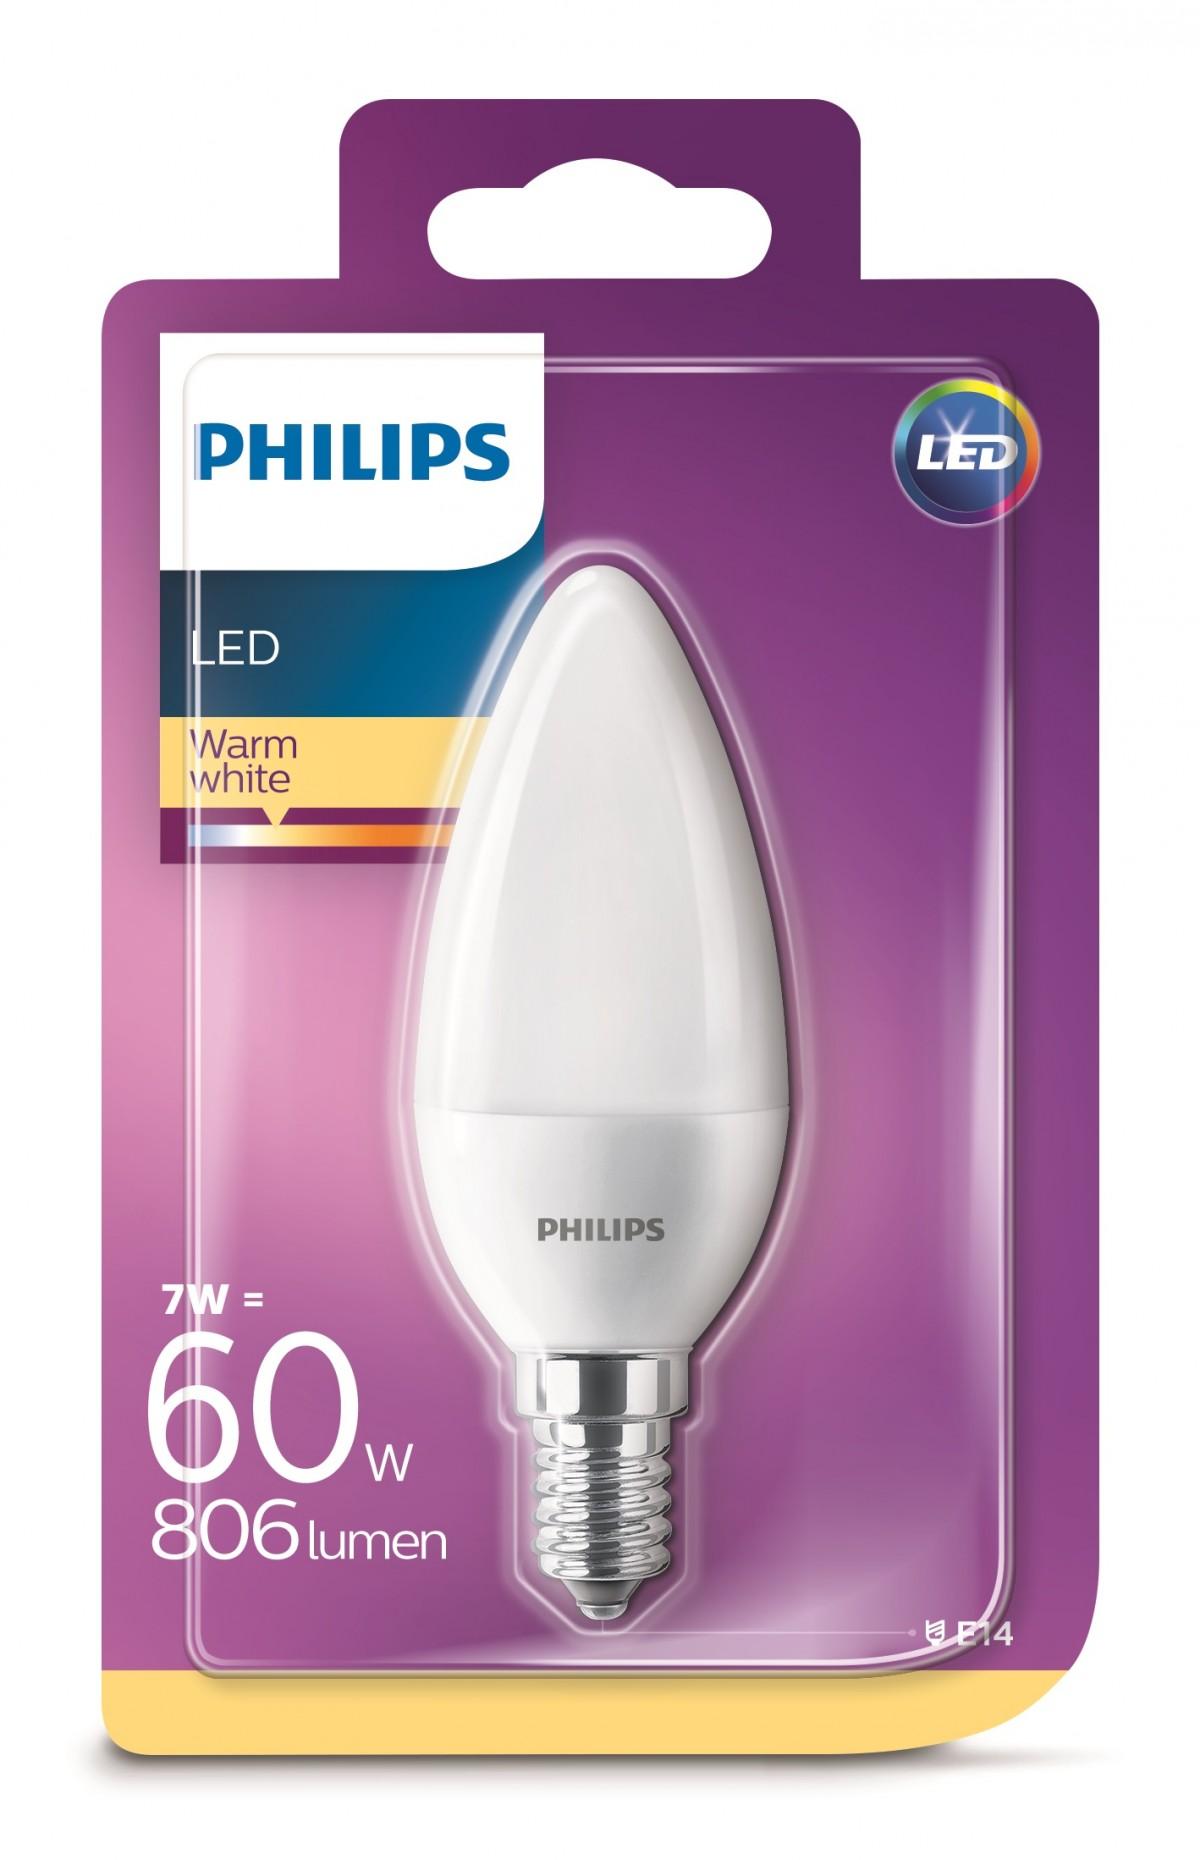 Philips Žárovka LED svíčka, 7W, E14, teplá bílá